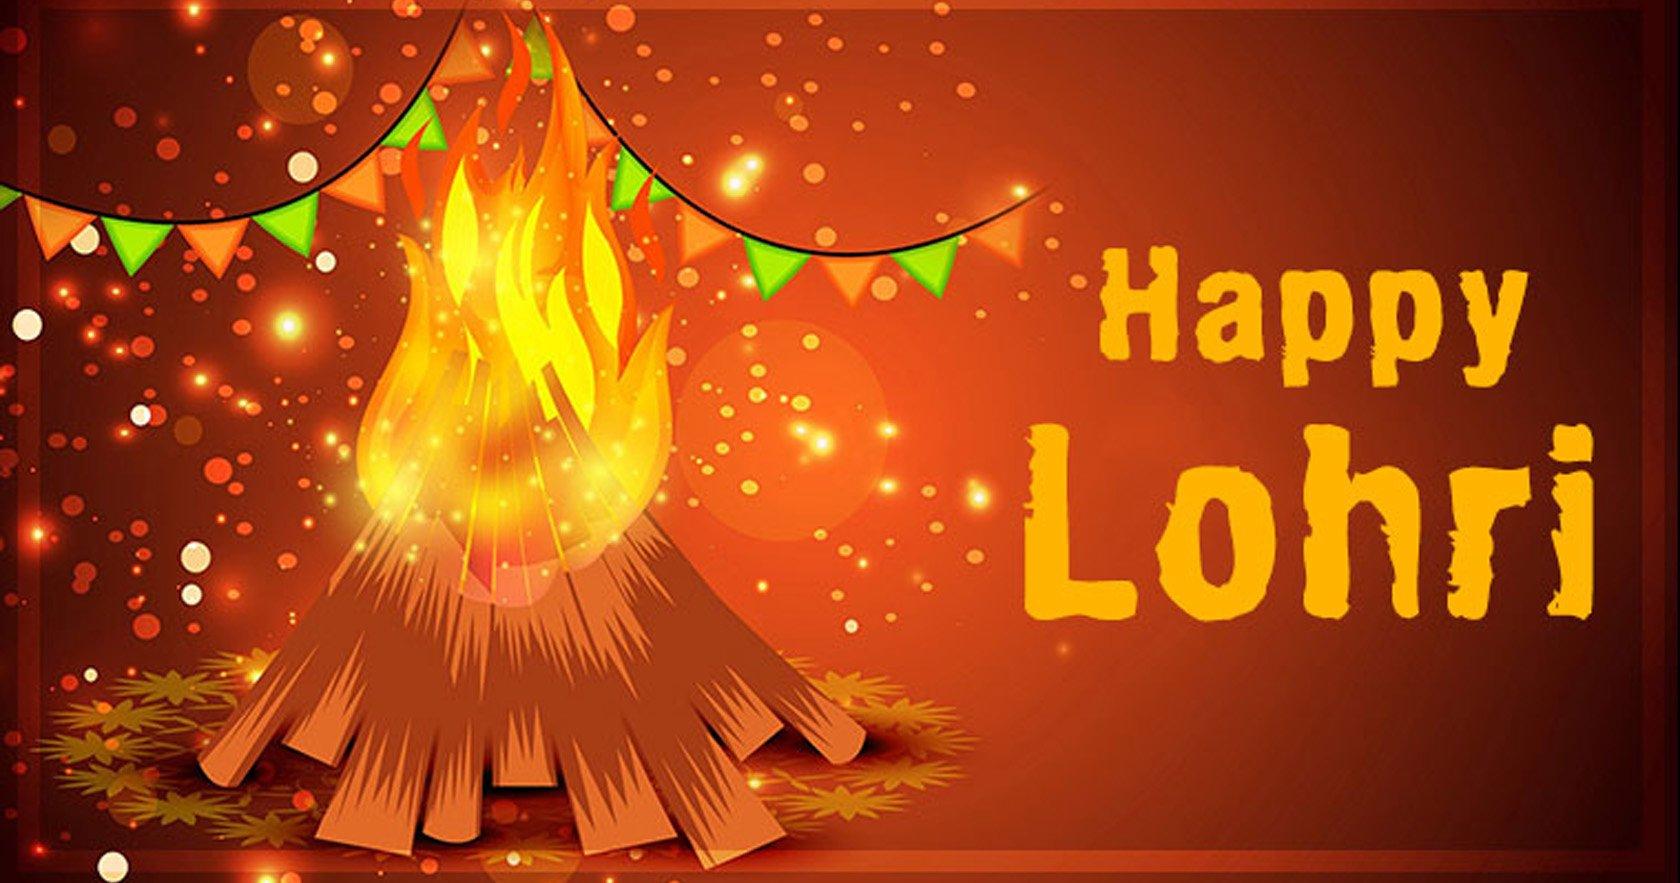 Lohri Images: Best Happy Lohri Images Wishes 2020